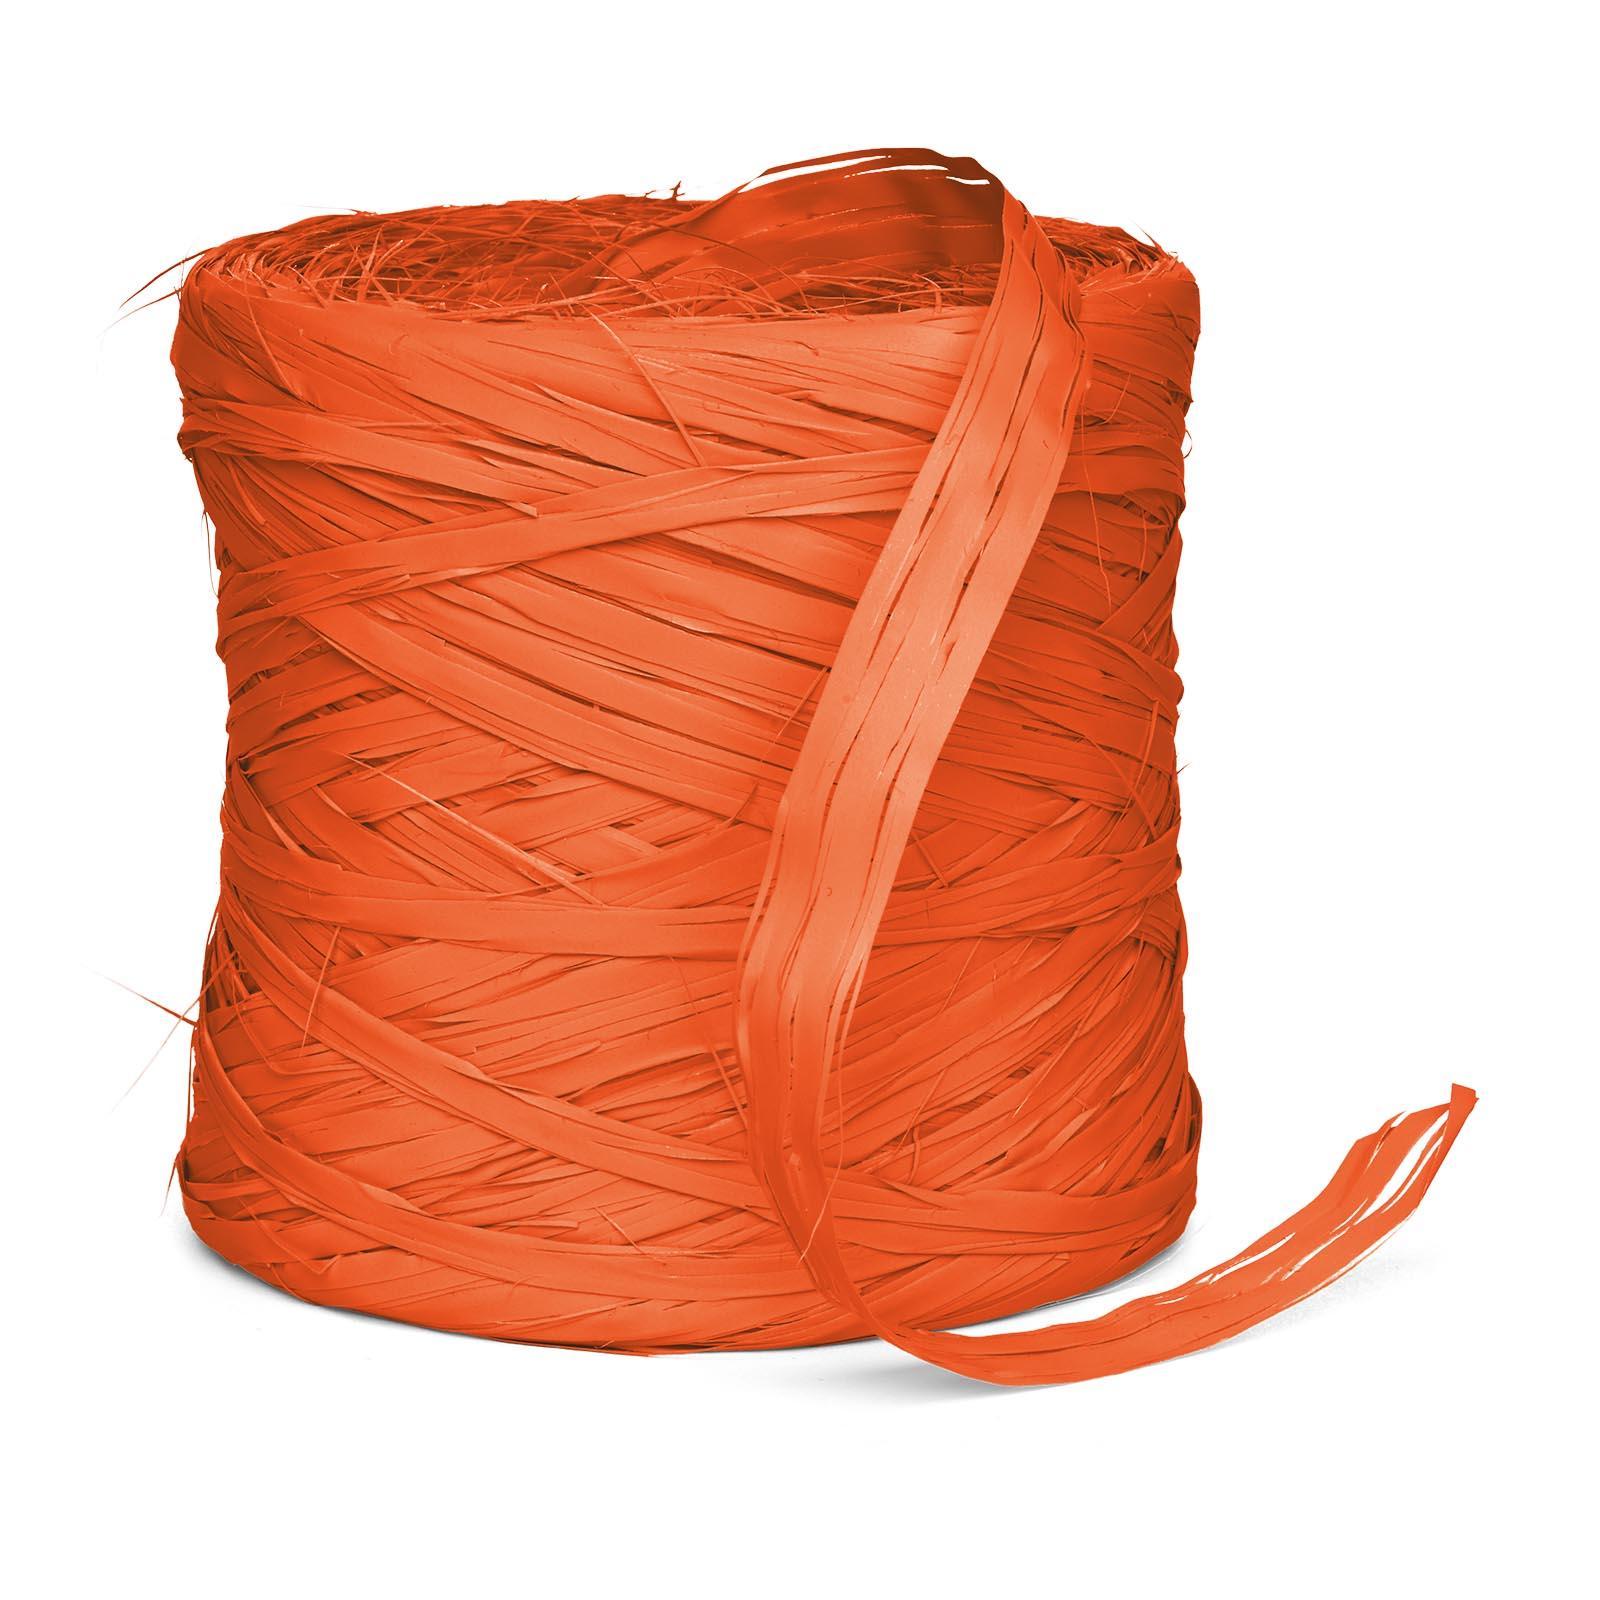 Geschenkbast raphia synthetik orange 200m geschenkbast for Restposten dekoartikel